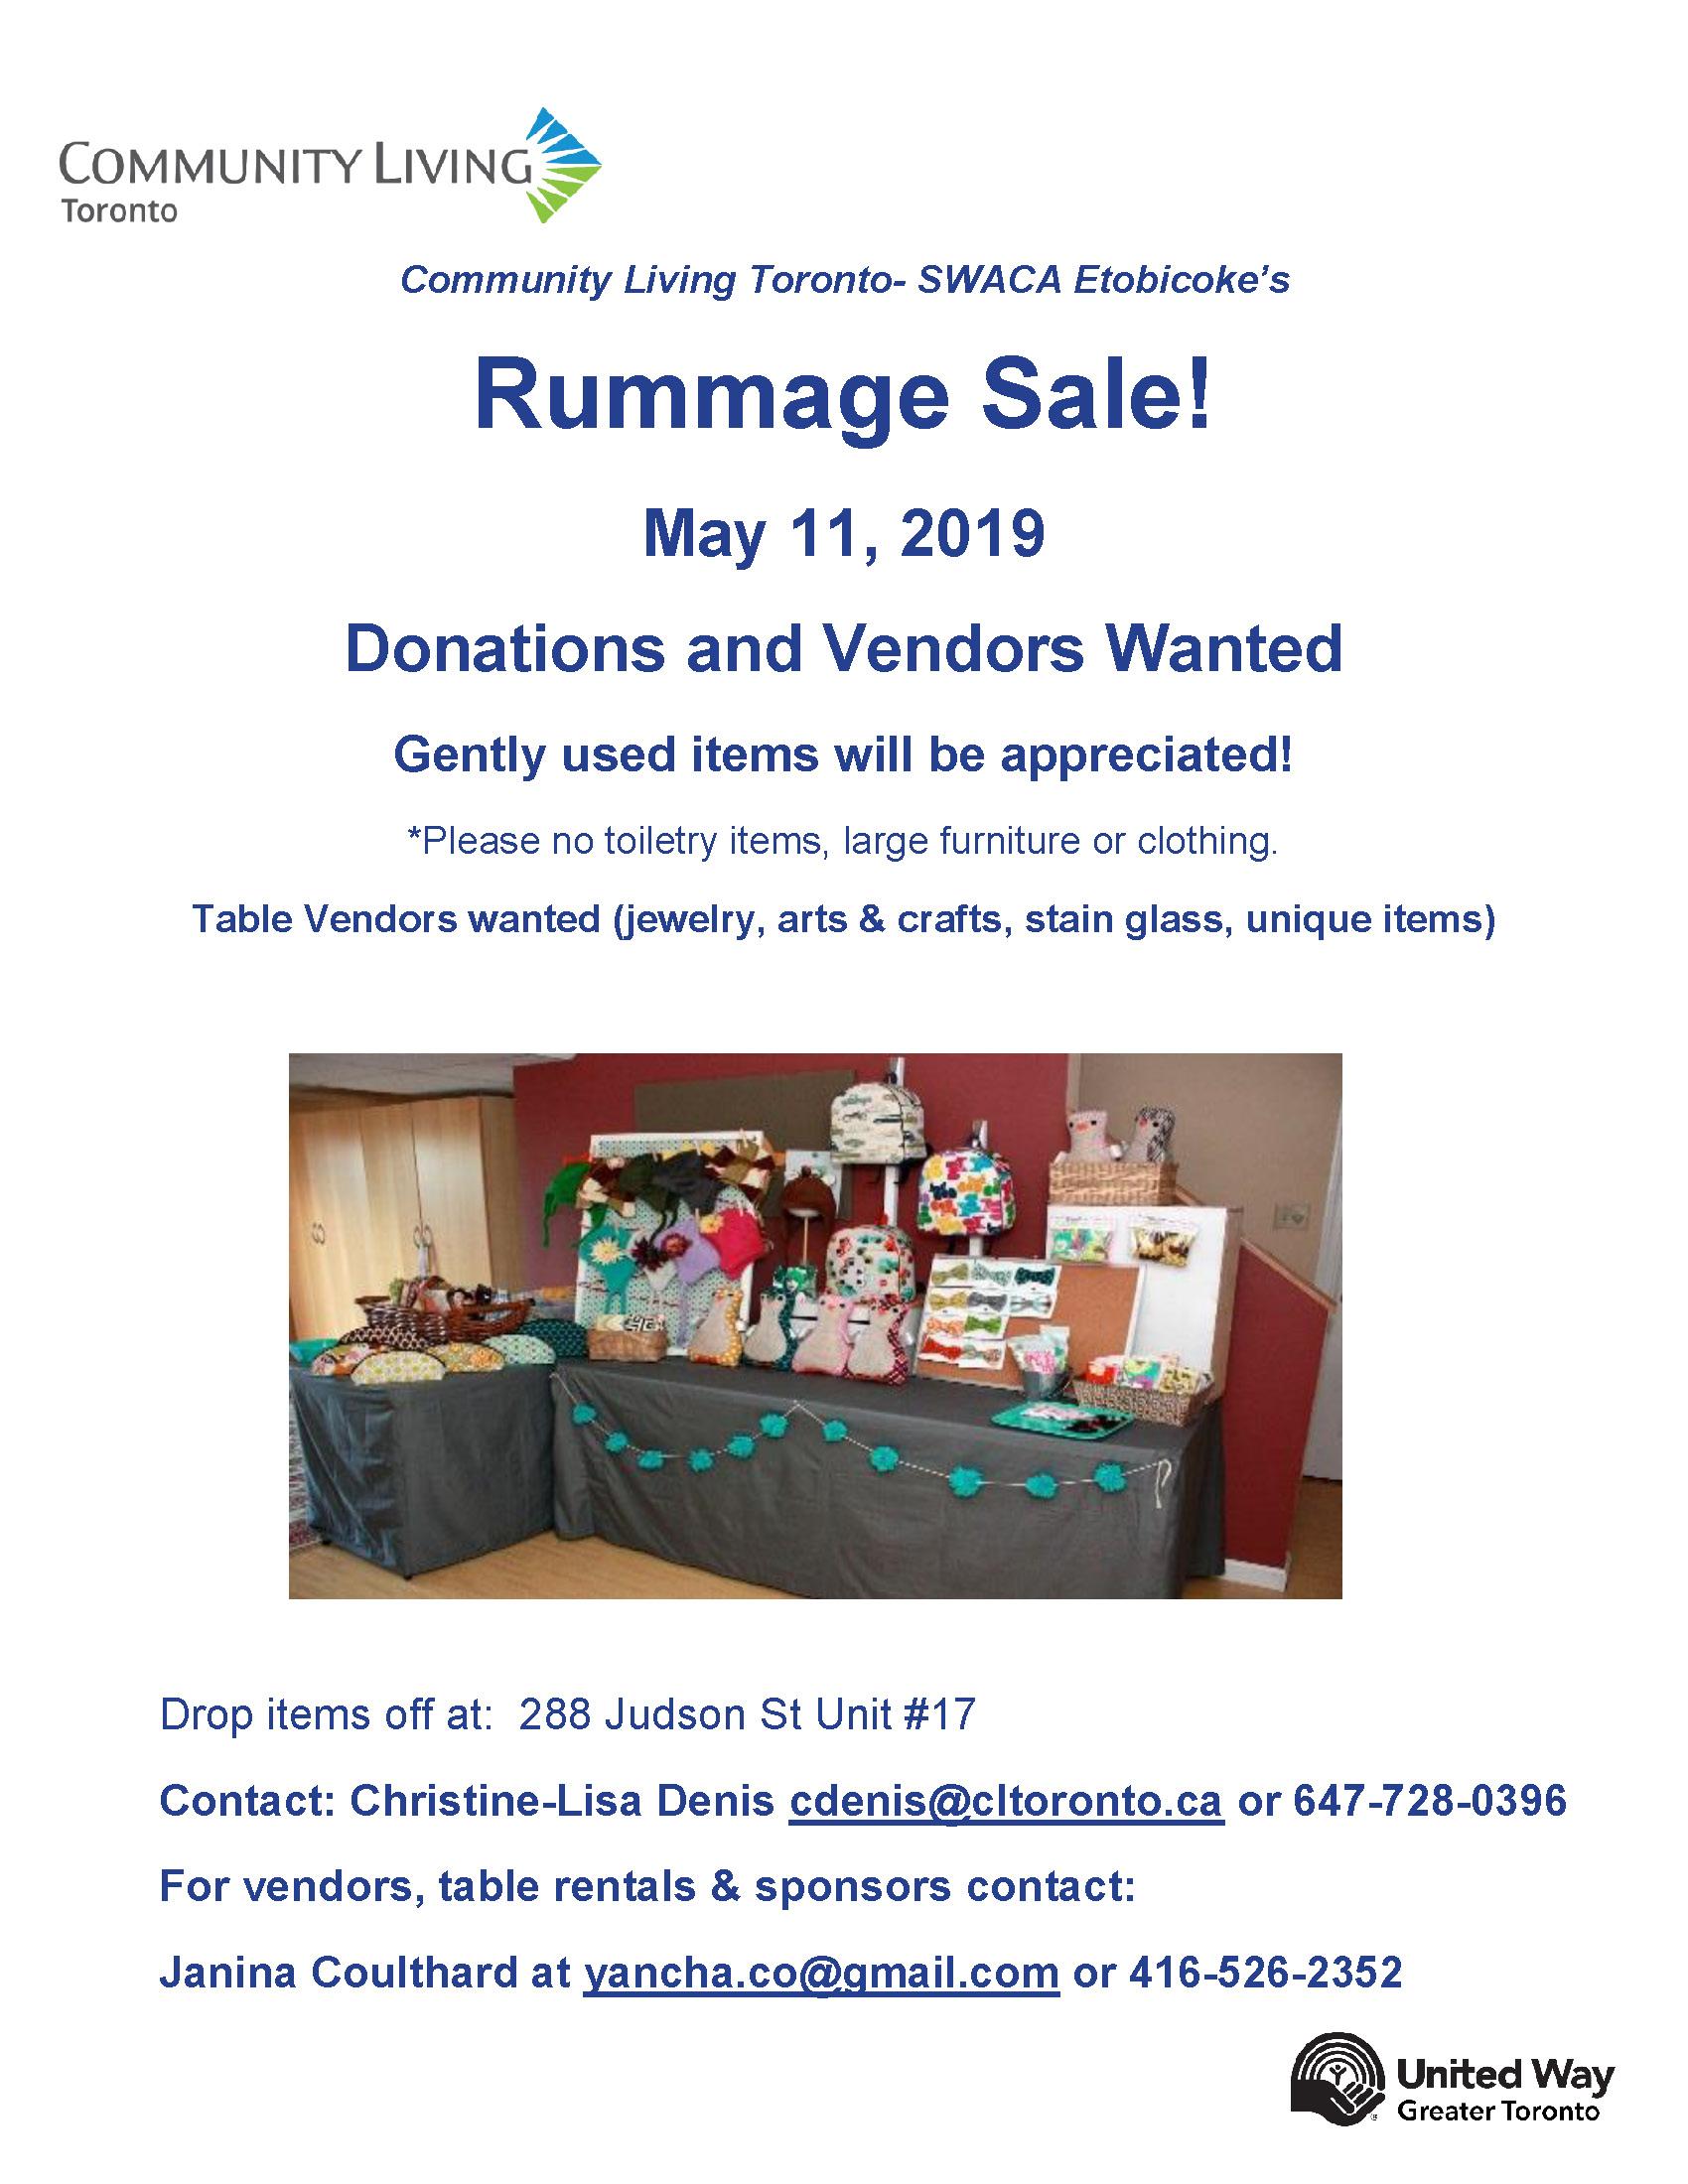 Rummage Sale- Donations